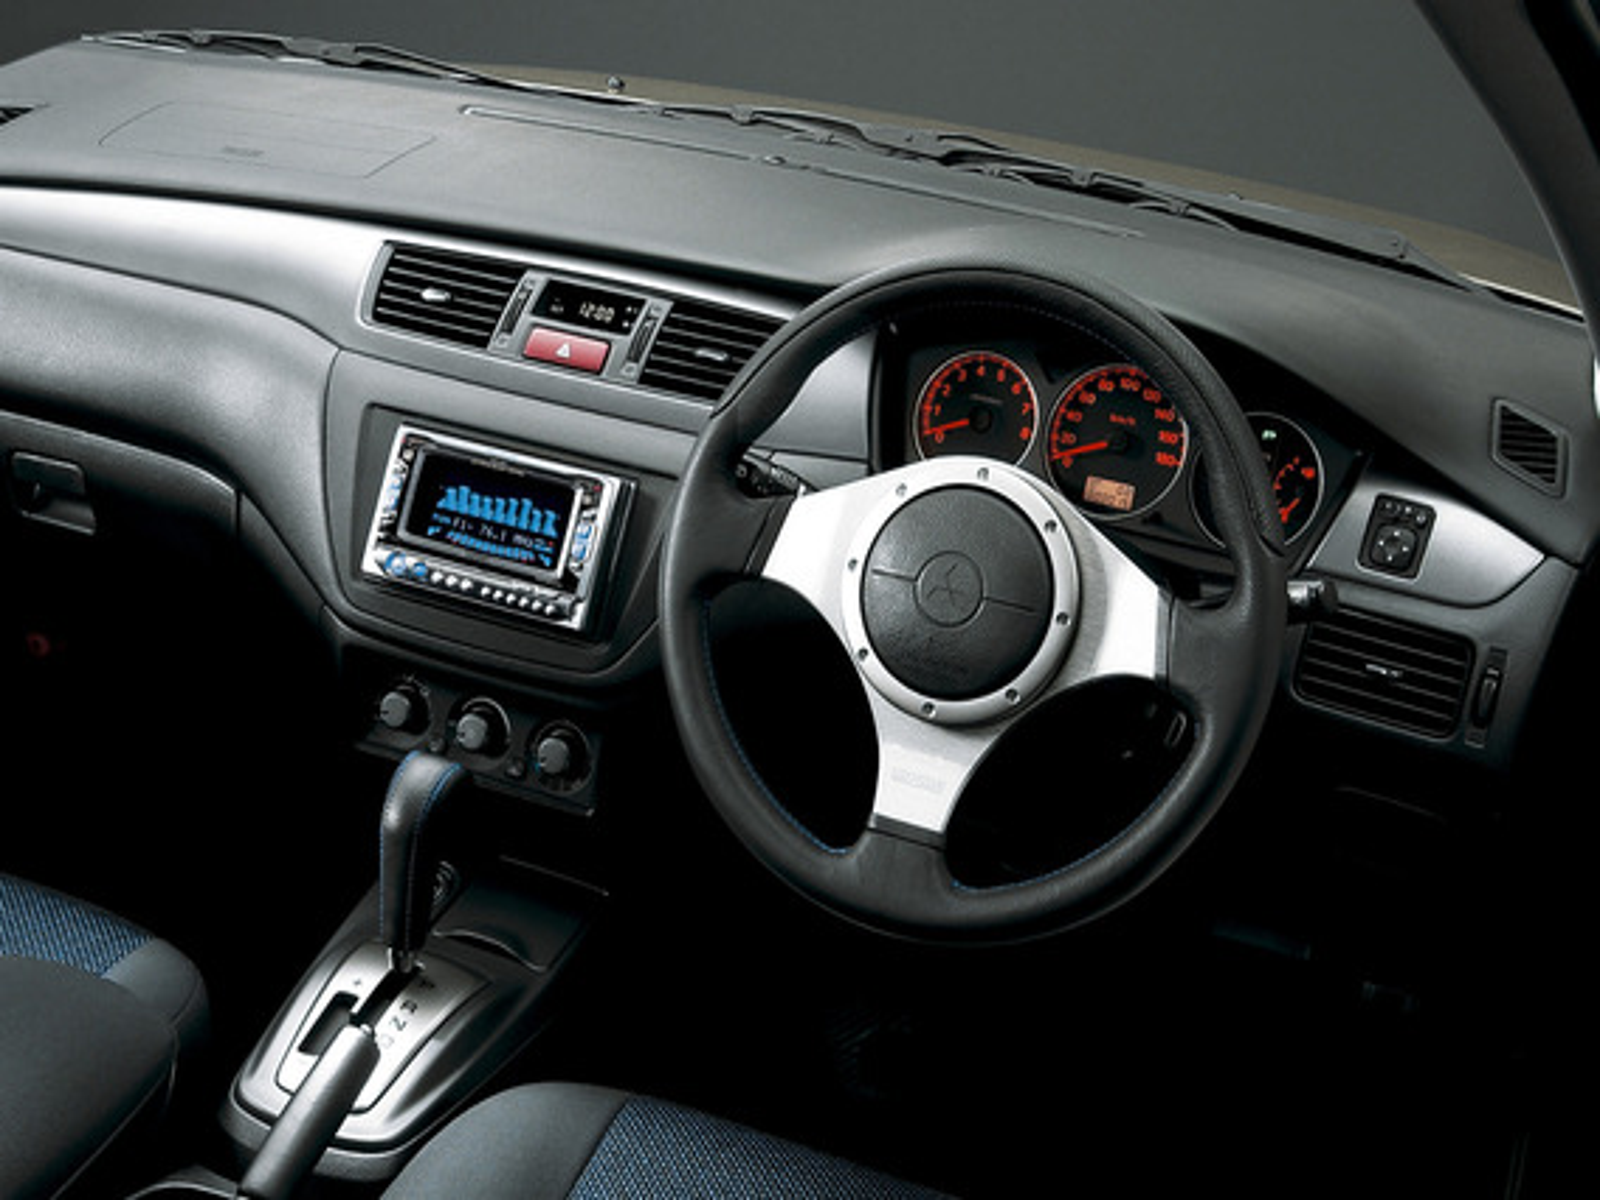 Замена лампочки в блоке климат-контроля на Mitsubishi Lancer 9